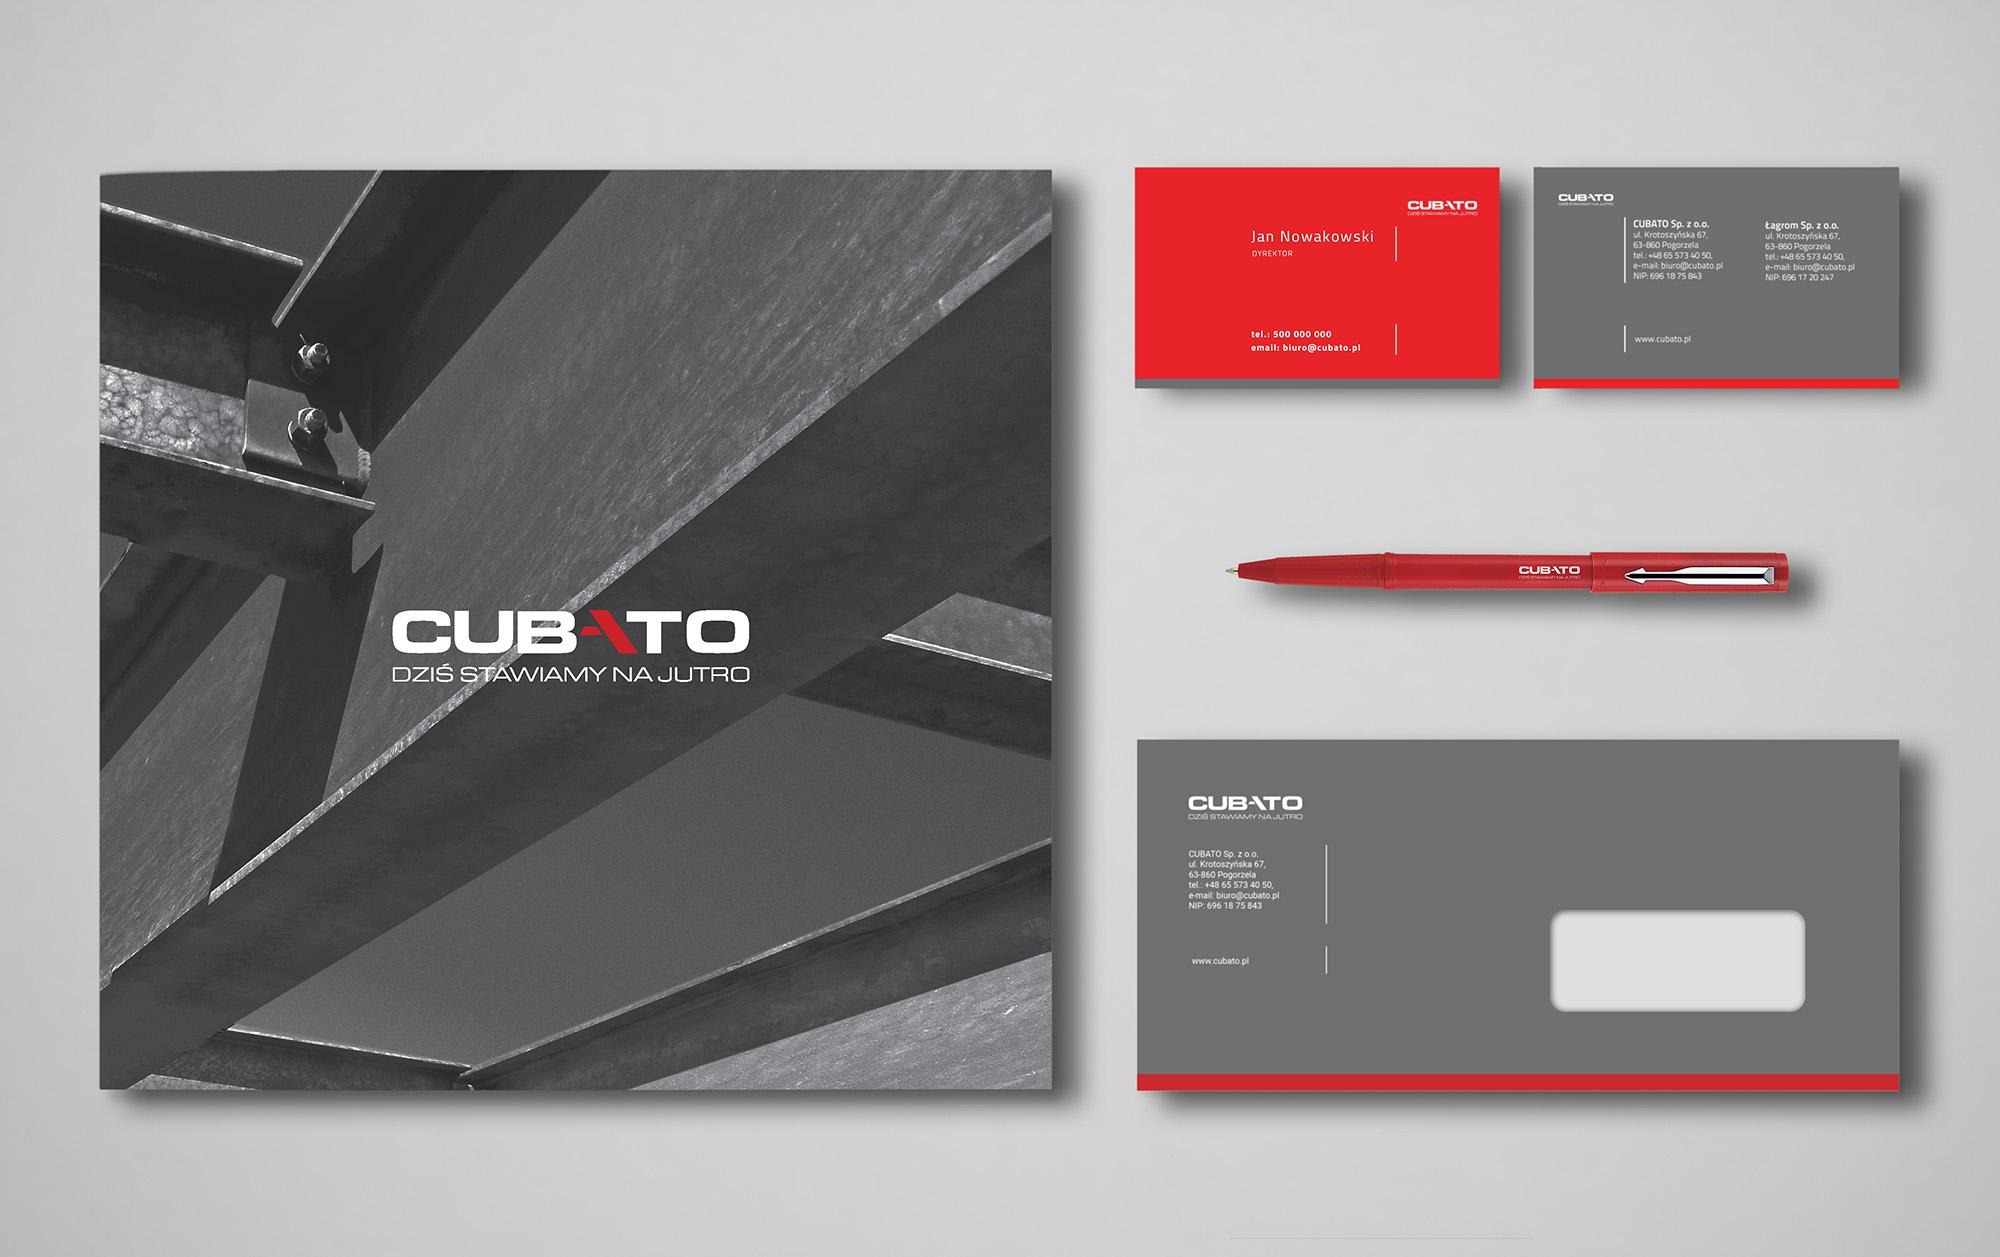 projekty graficzne, design logo, ilustracja, concept art, key visual, CUBATO, designer Ireneusz Bloch